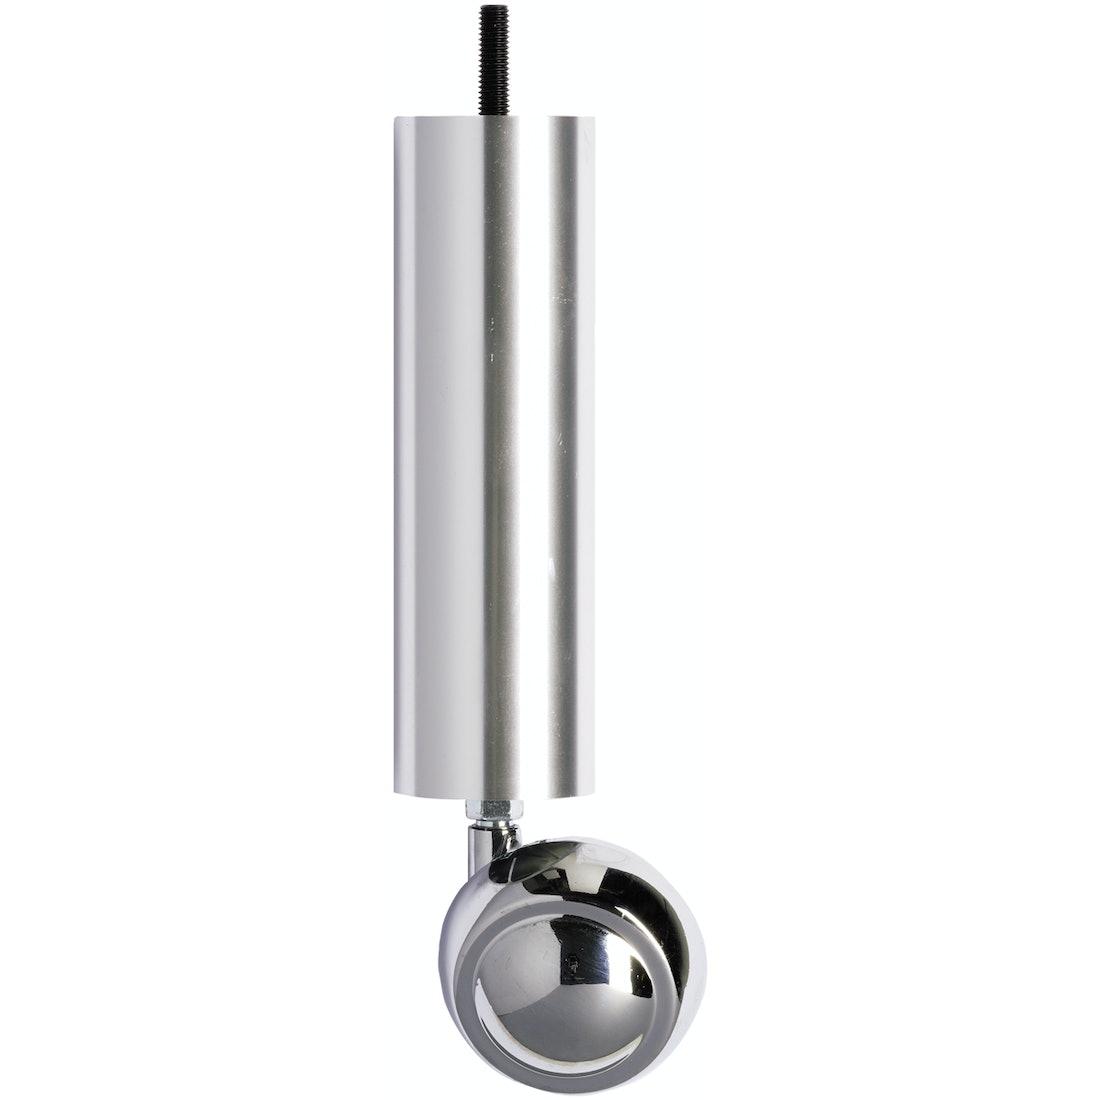 DUX Senge DUX Sengeben - Aluminium m. hjul (2-pak), Timm Møbler